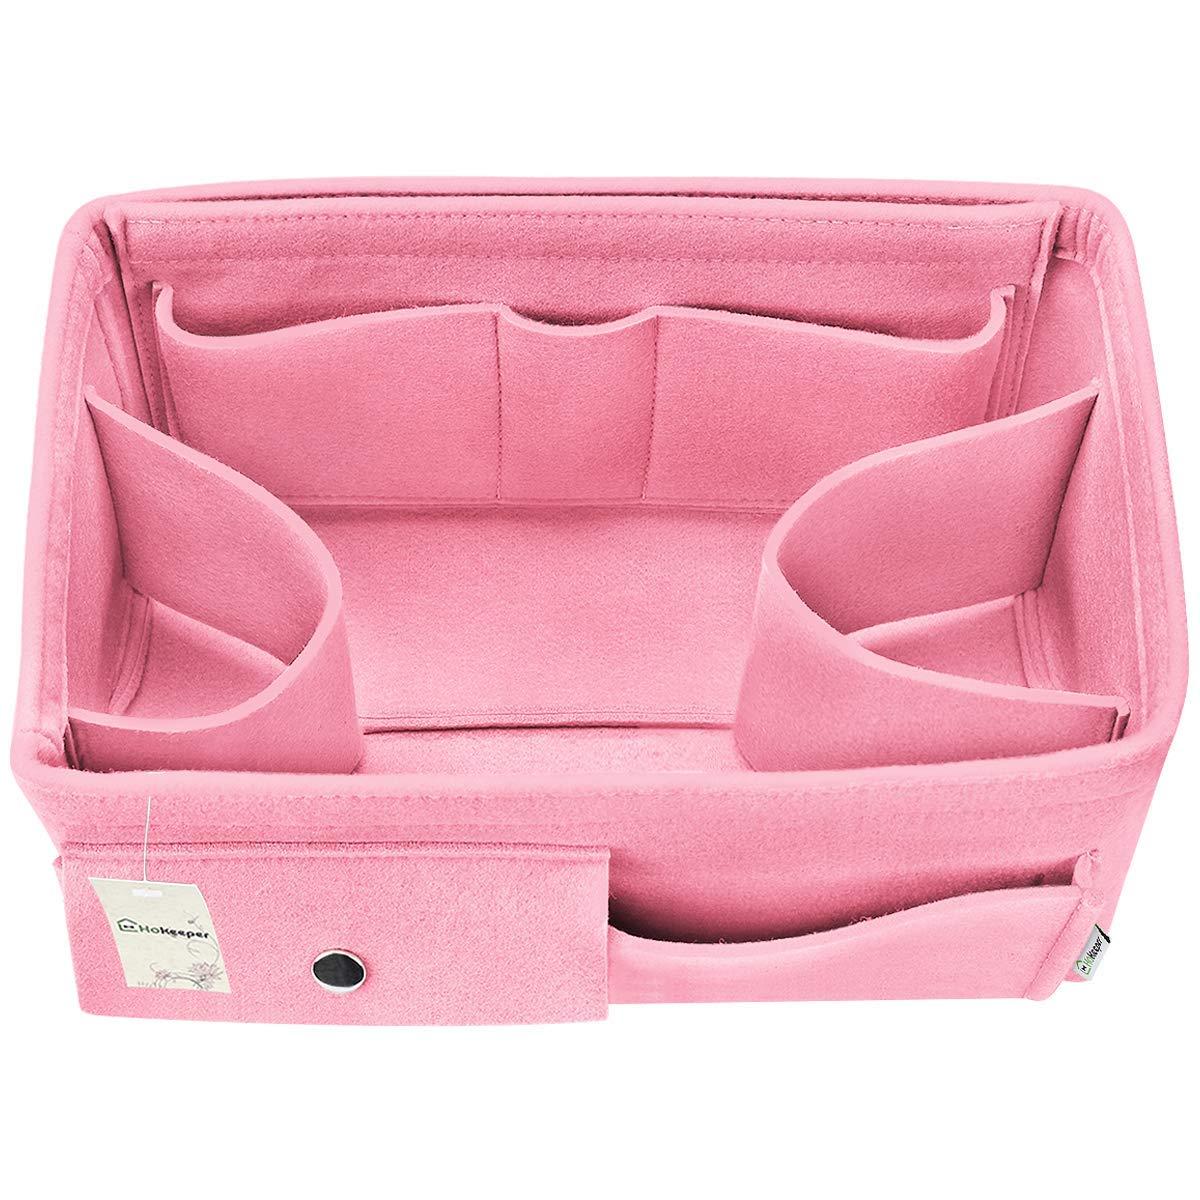 Felt Purse Insert Organizer, Handbag Organizer, Bag in Bag, Diaper Bag Organizer, 12 Pockets, 3 Sizes, 5 Colors